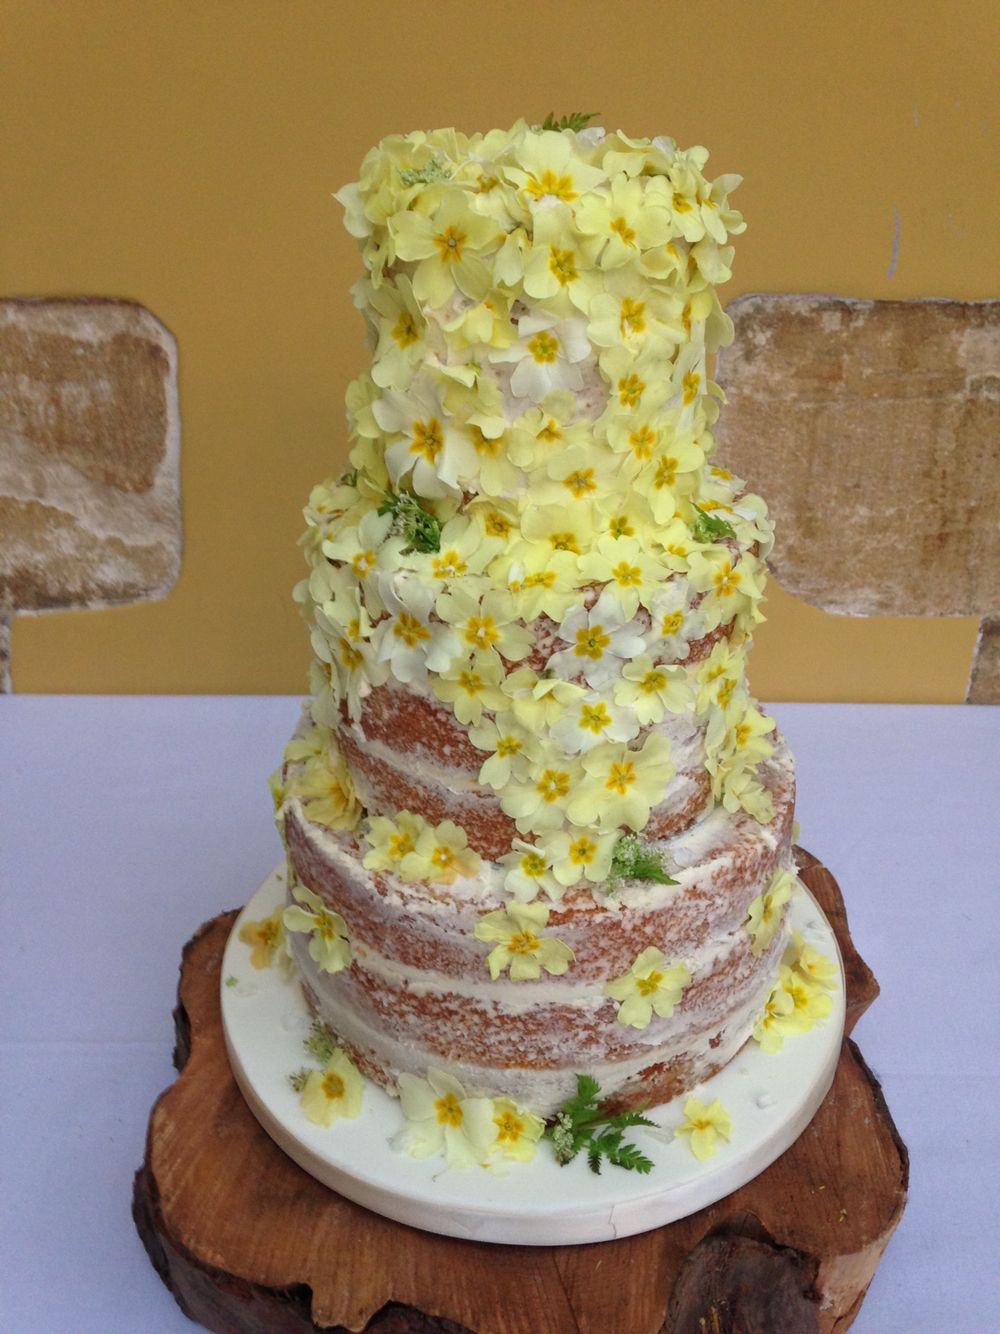 Fresh edible flower naked cakes at Bibury Court, Bibury ...